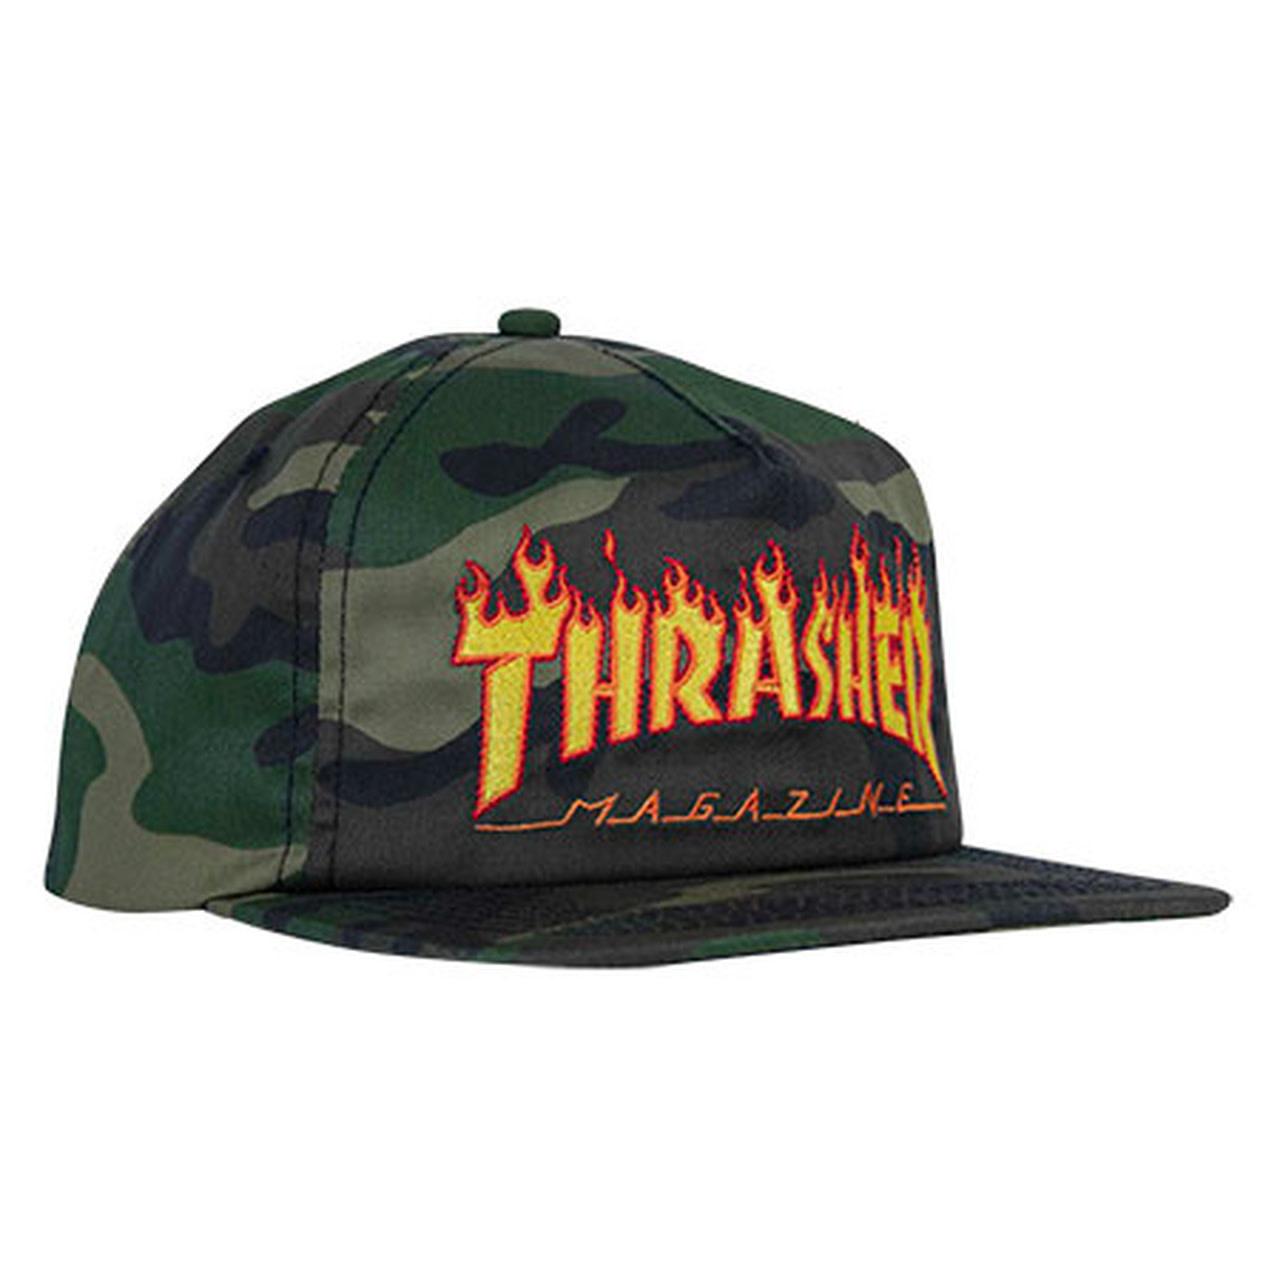 Thrasher Thrasher Flame Logo Snapback - Camo